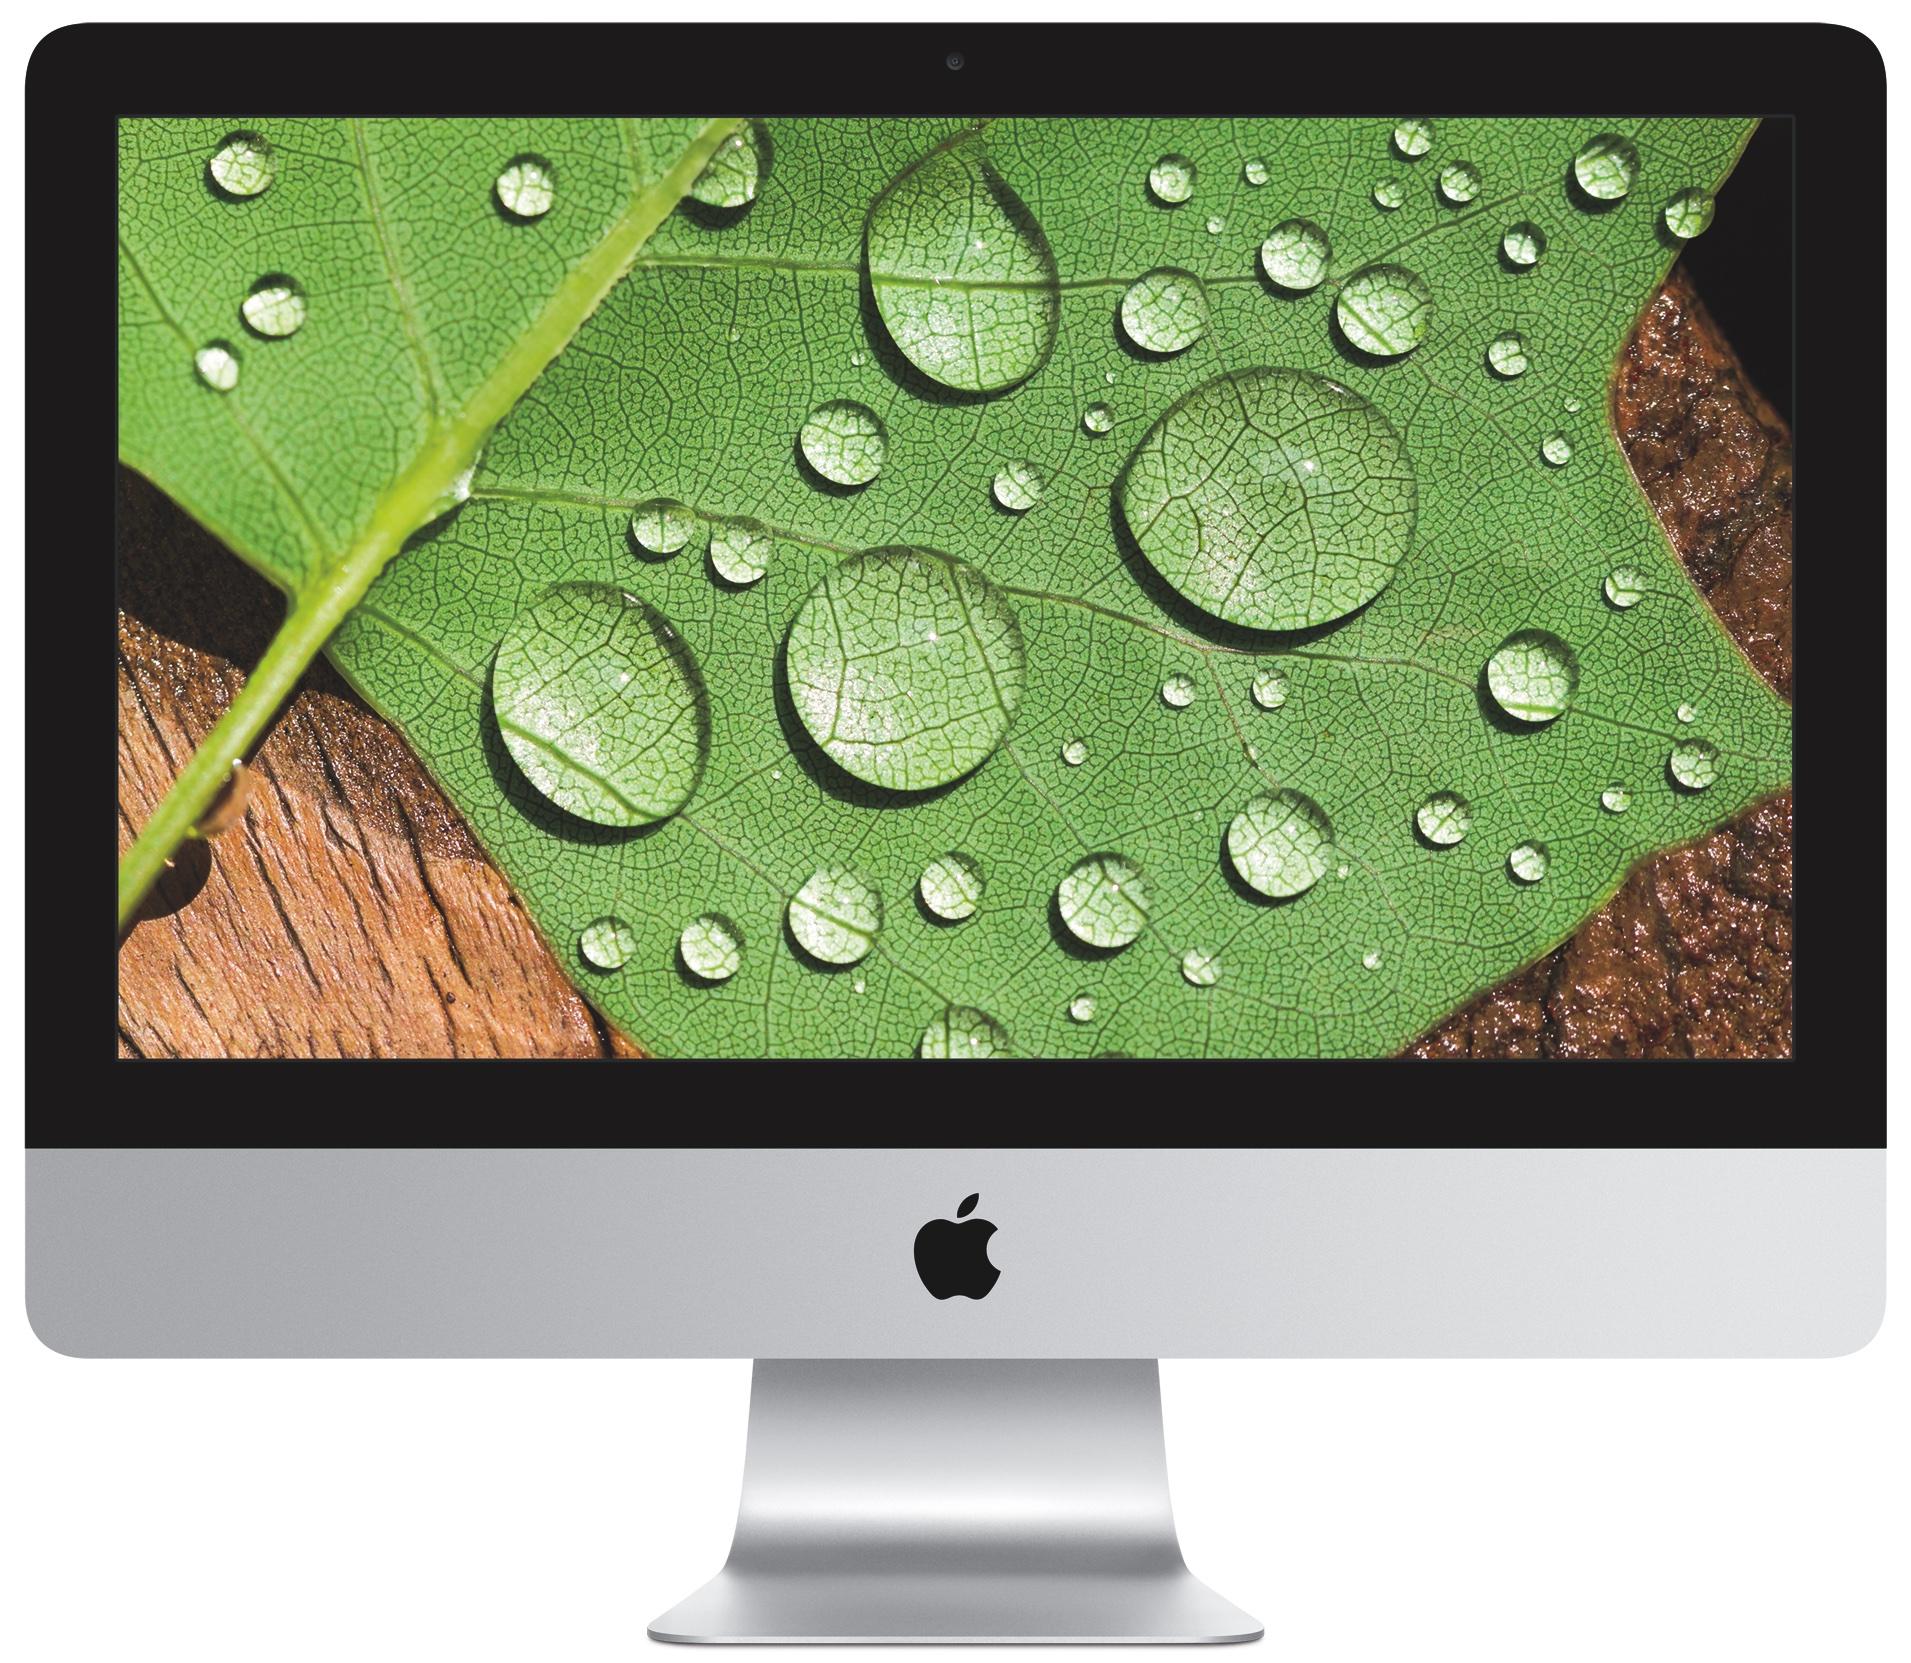 iMac late-2015 21.5 inch image 002